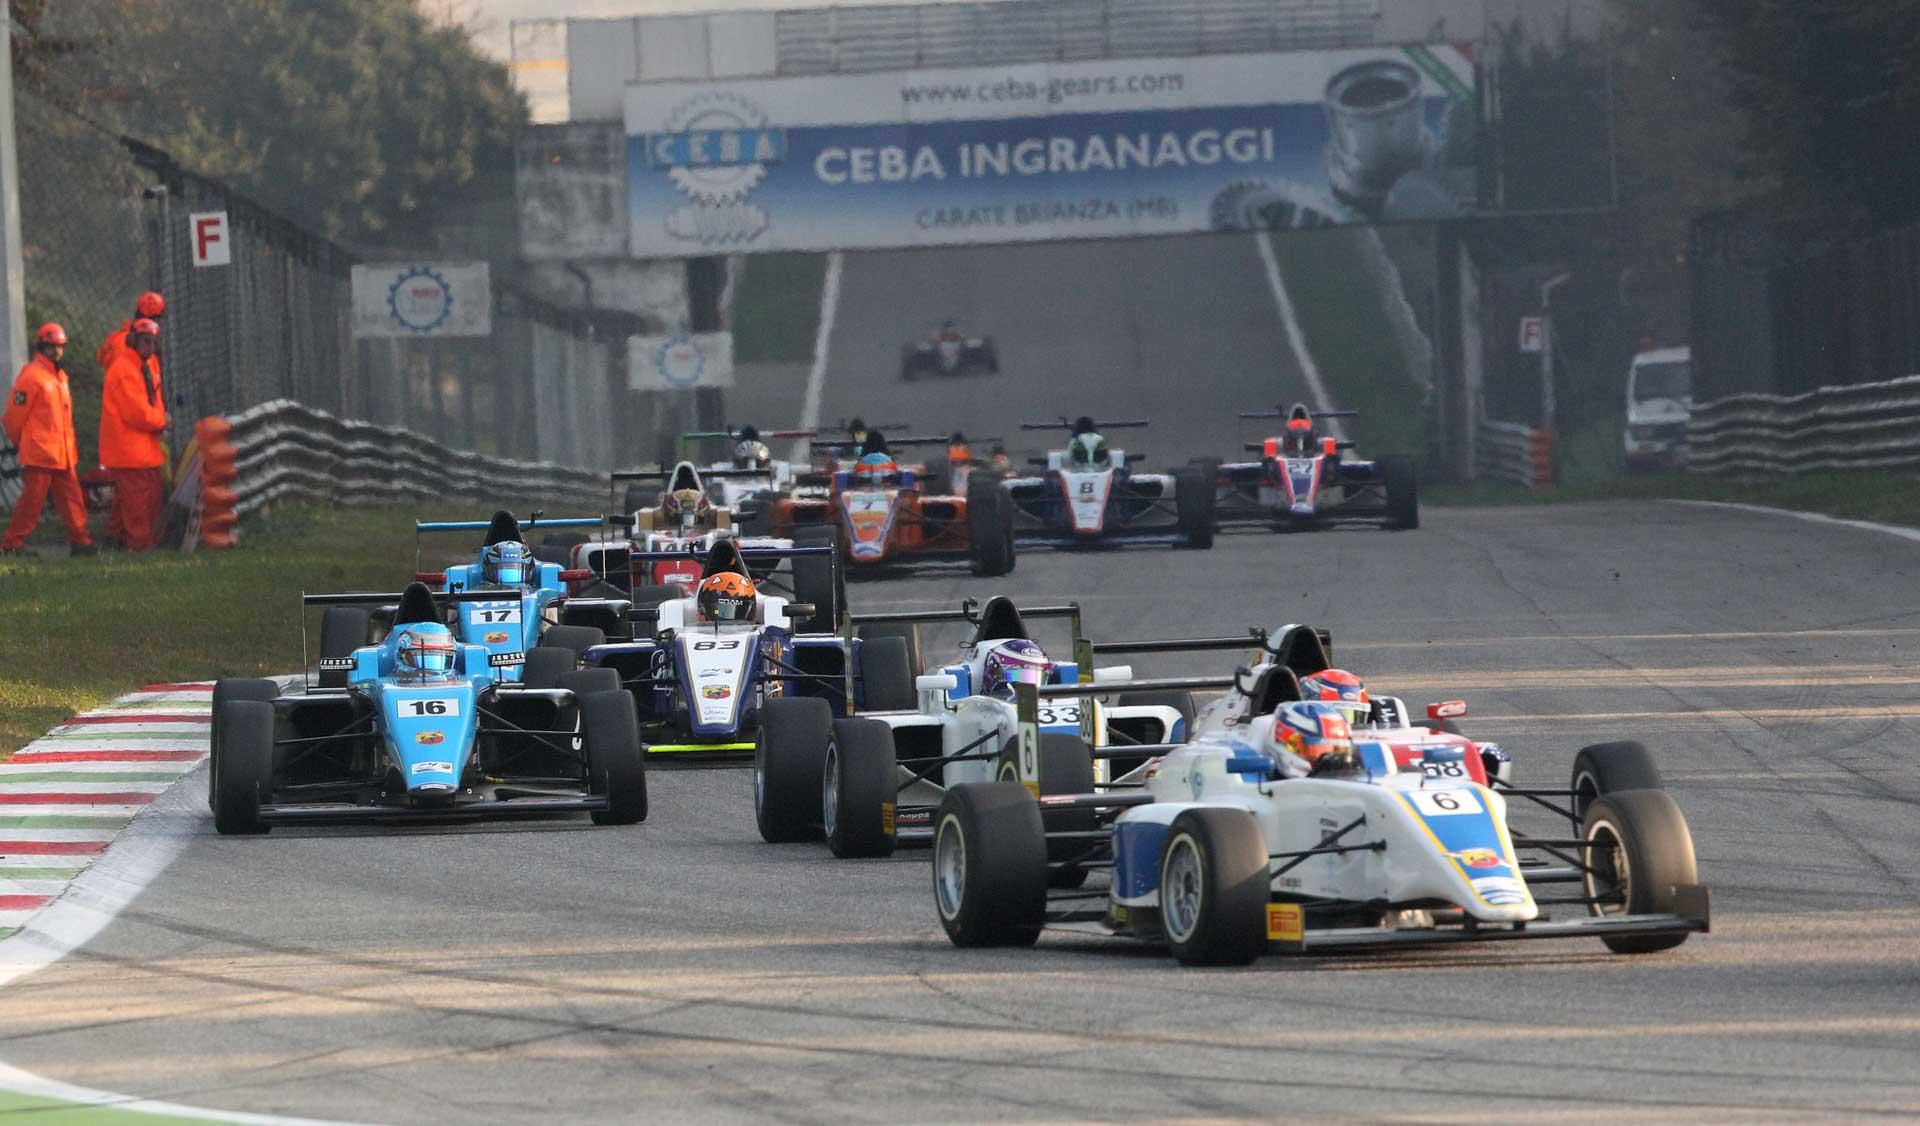 2016 Monza - VSR Jaden (15) Leading Gaggle